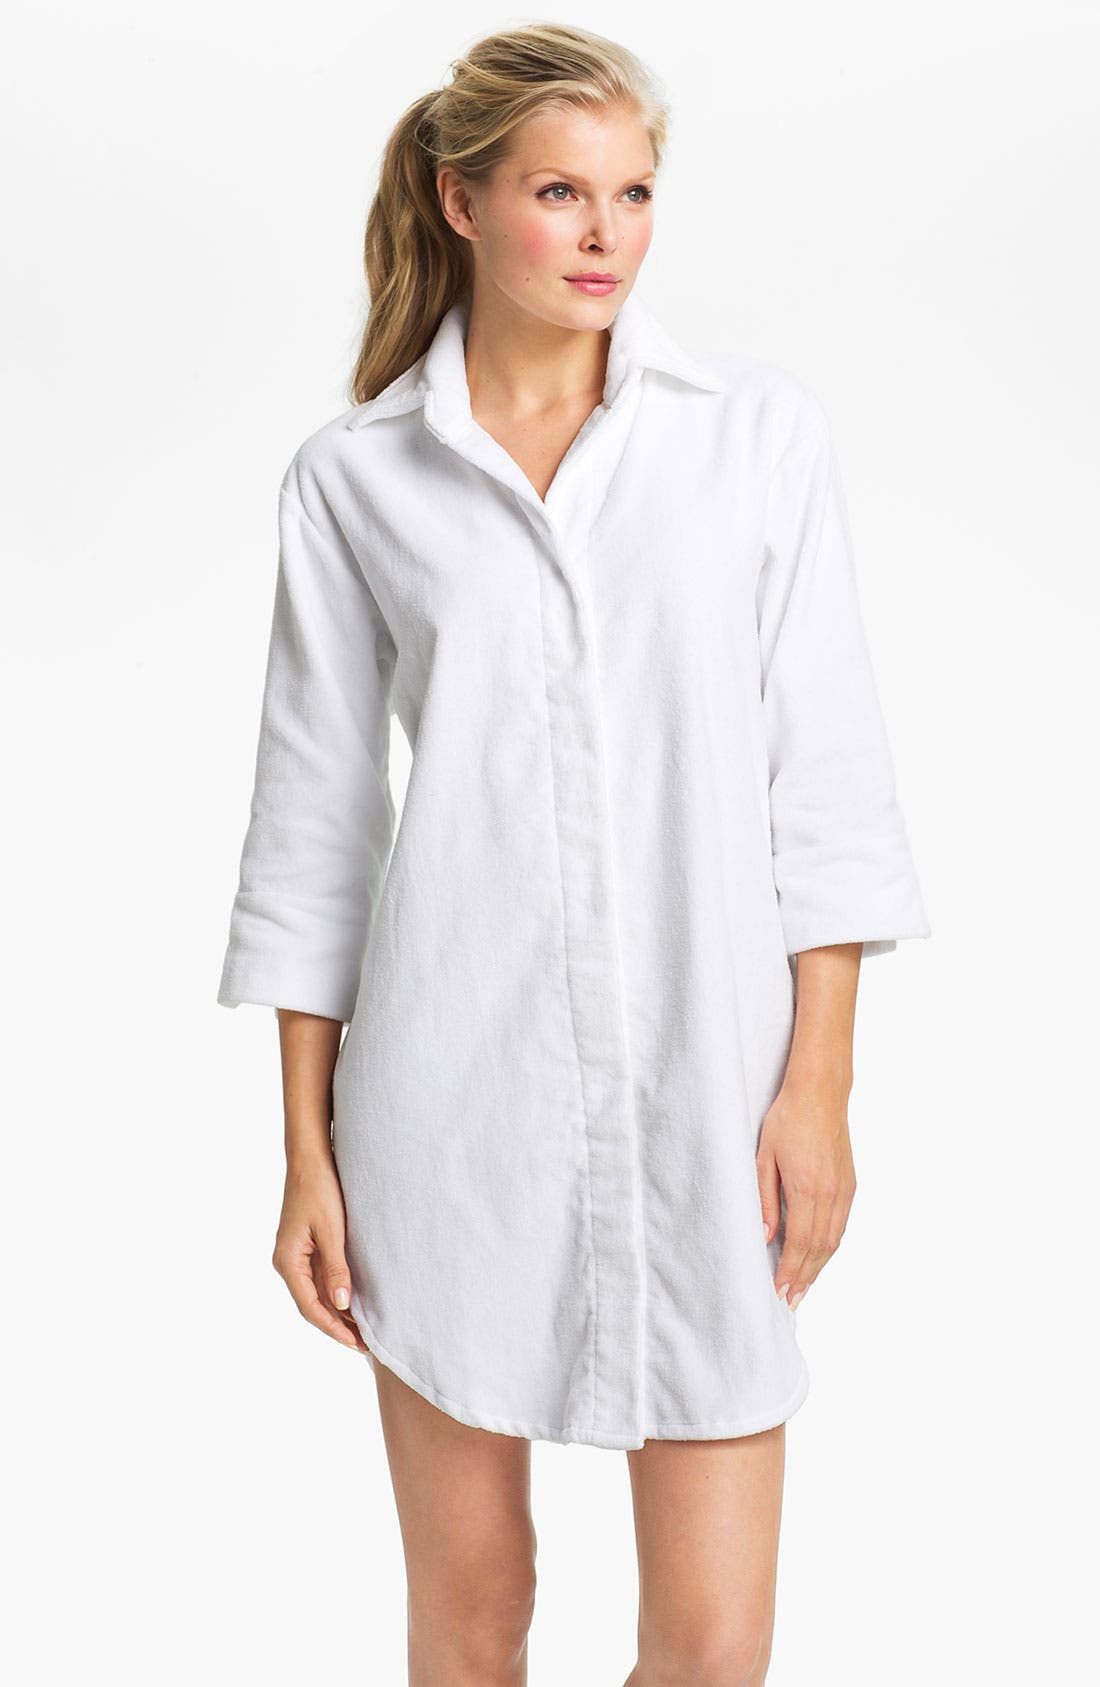 Main Image - Waterworks Studio Bath Shirt (Online Only)